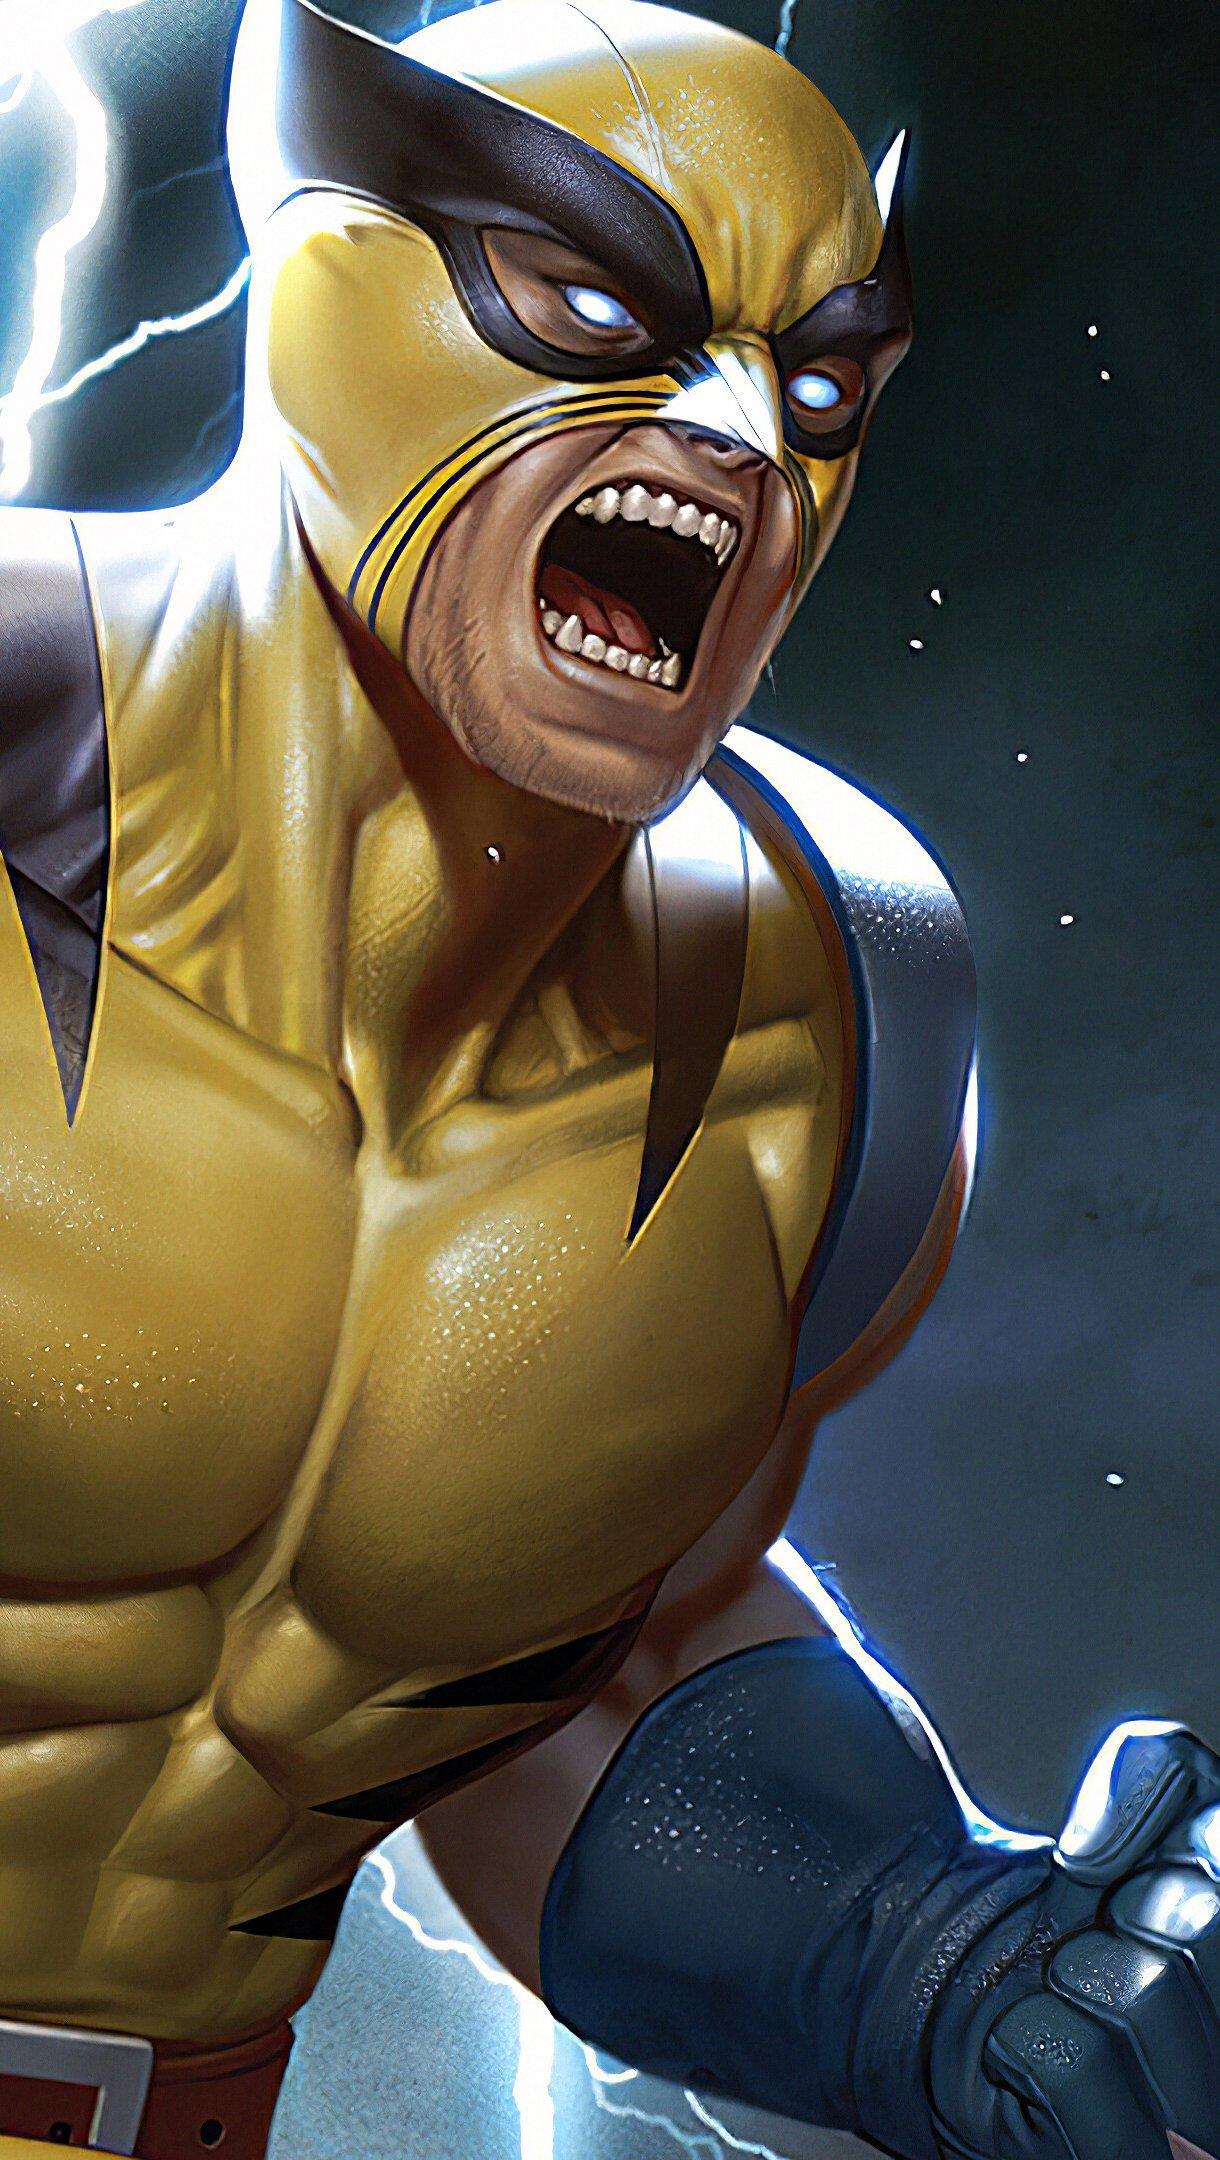 Fondos de pantalla Wolverine Fanart Vertical